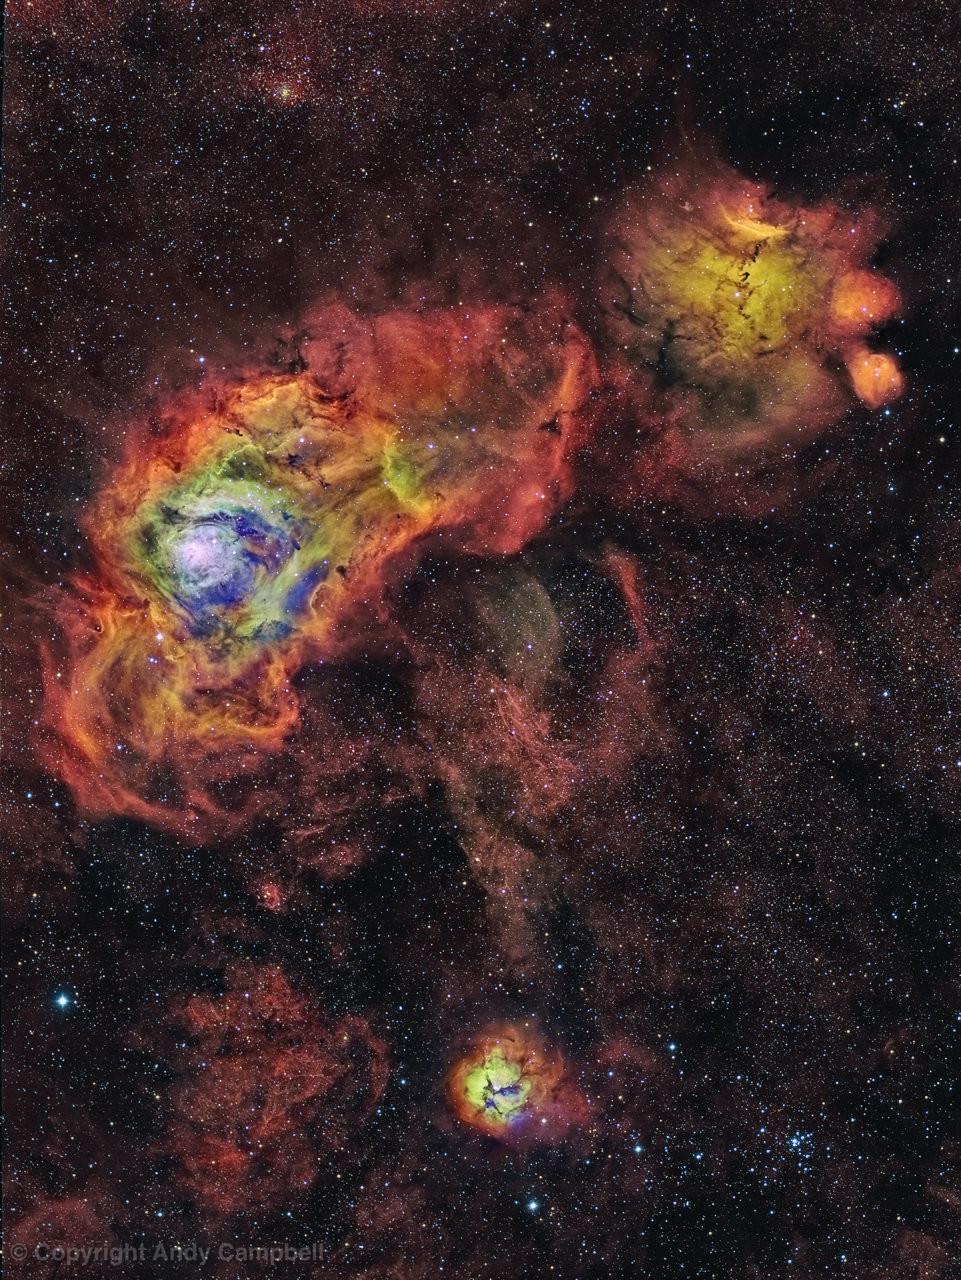 nebula M20, M8 & NGC 6334 narrowband image sagittarius